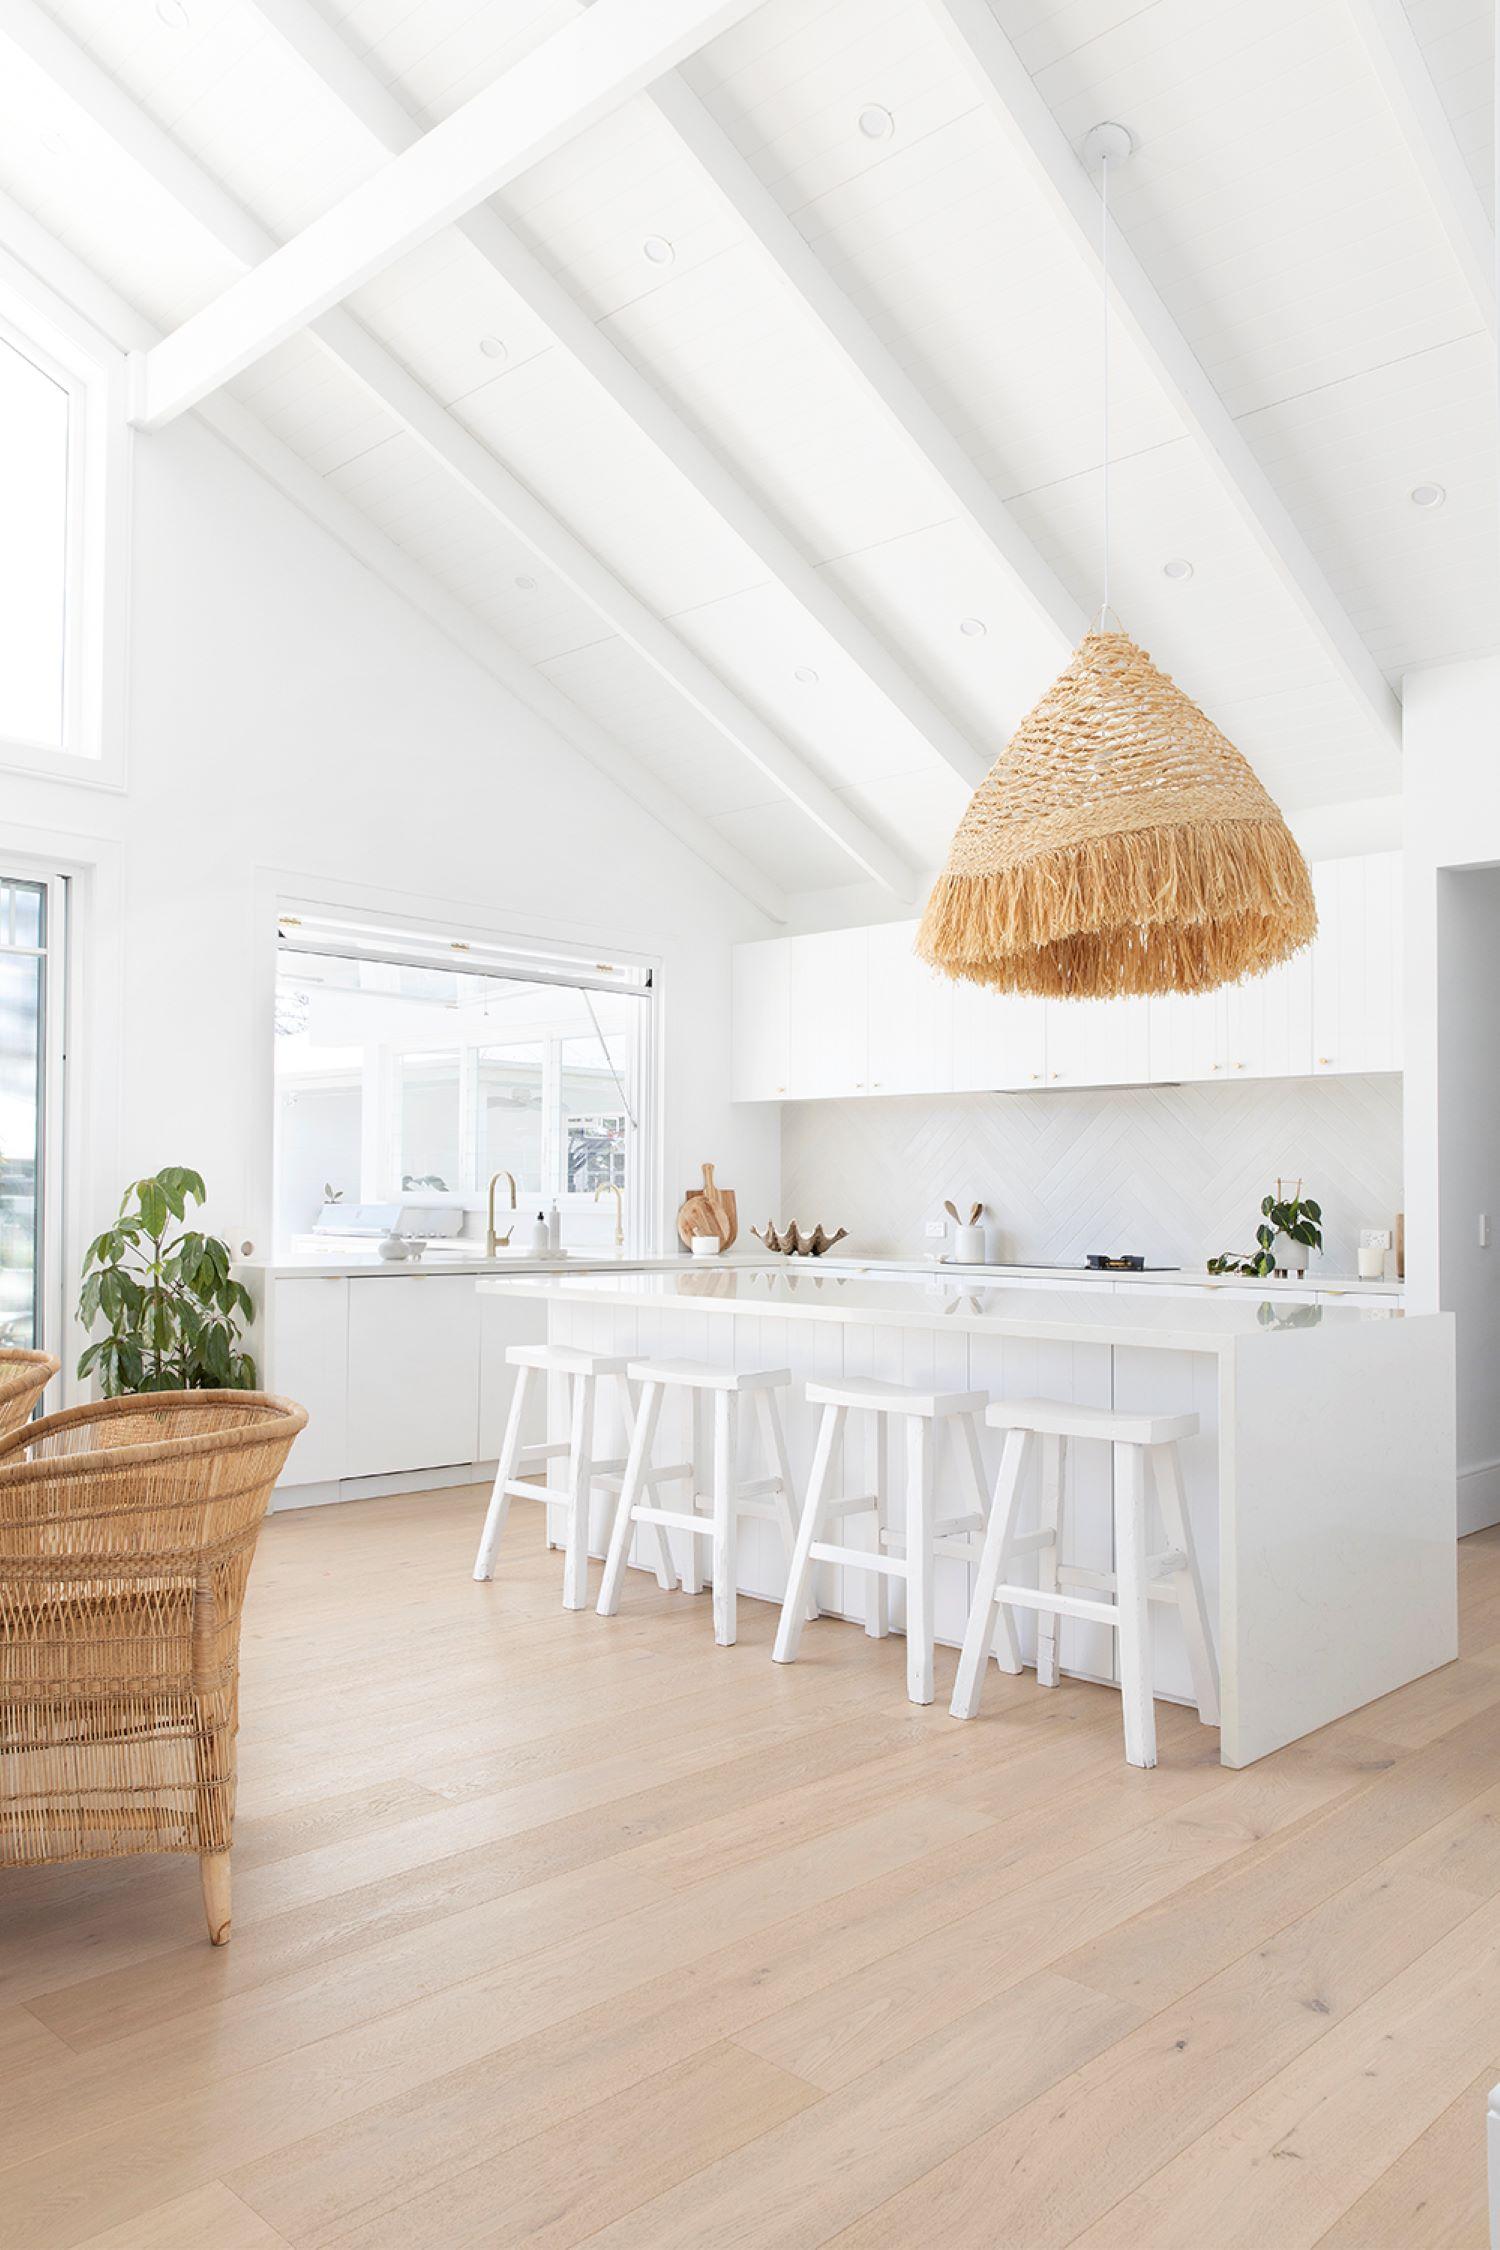 the-coastal-barn-dream-home-kitchen-design